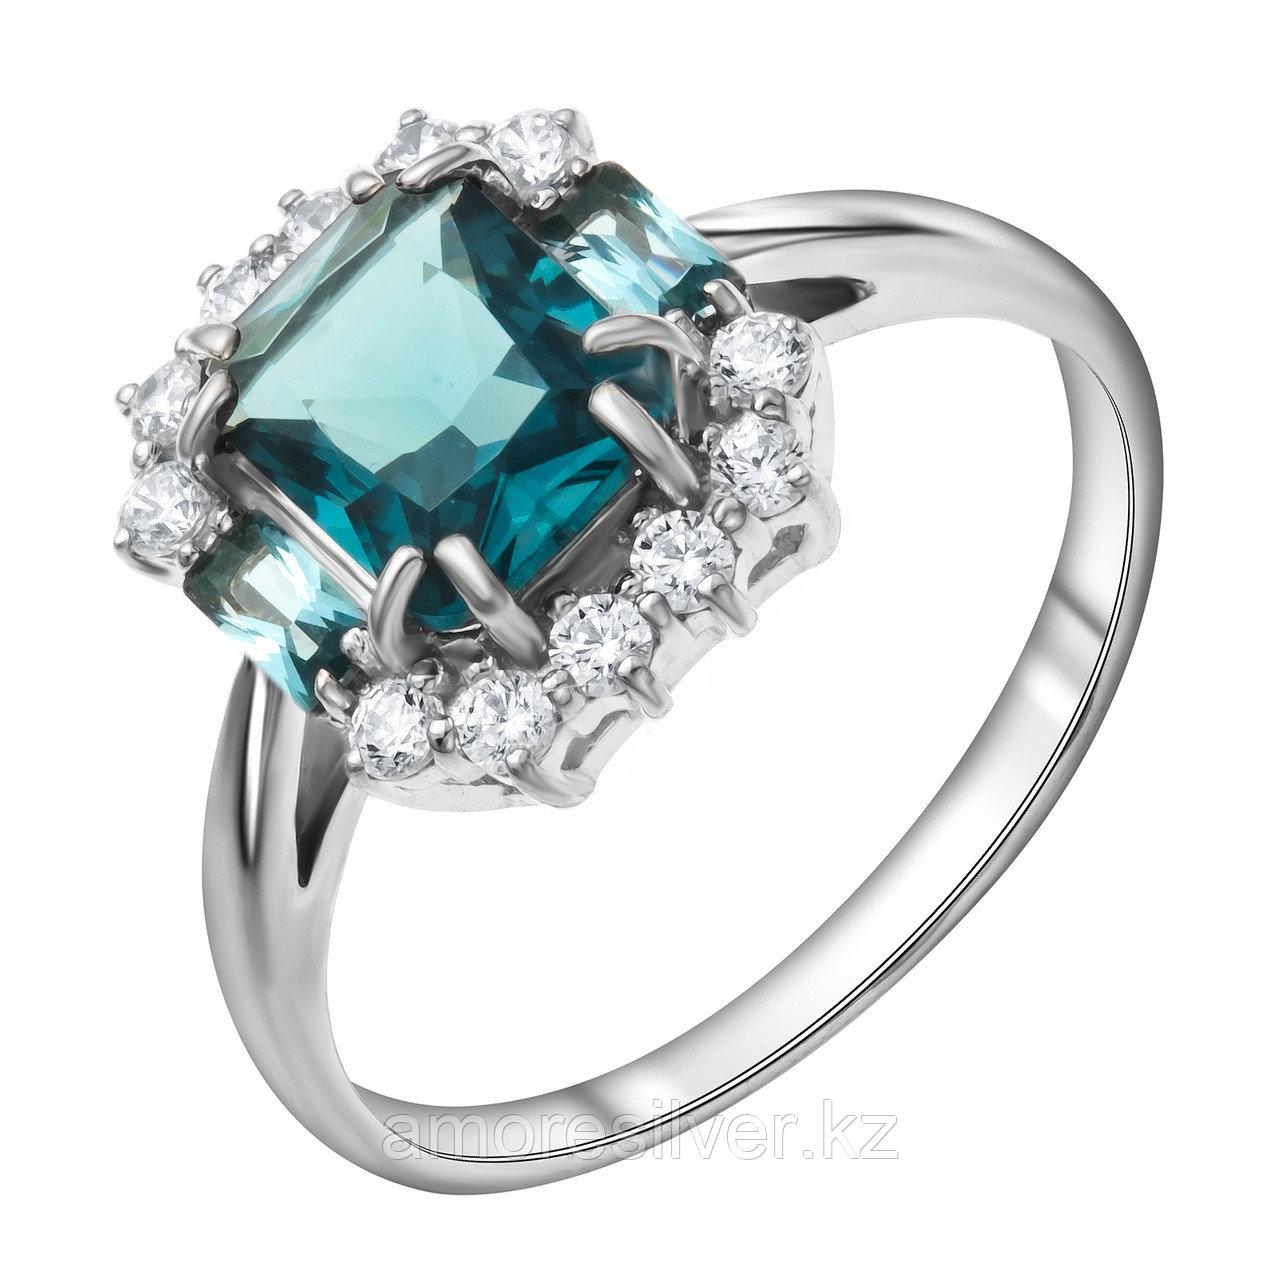 "Кольцо TEOSA серебро с родием, кристалл фианит, ""halo"" 100-1241-TL"